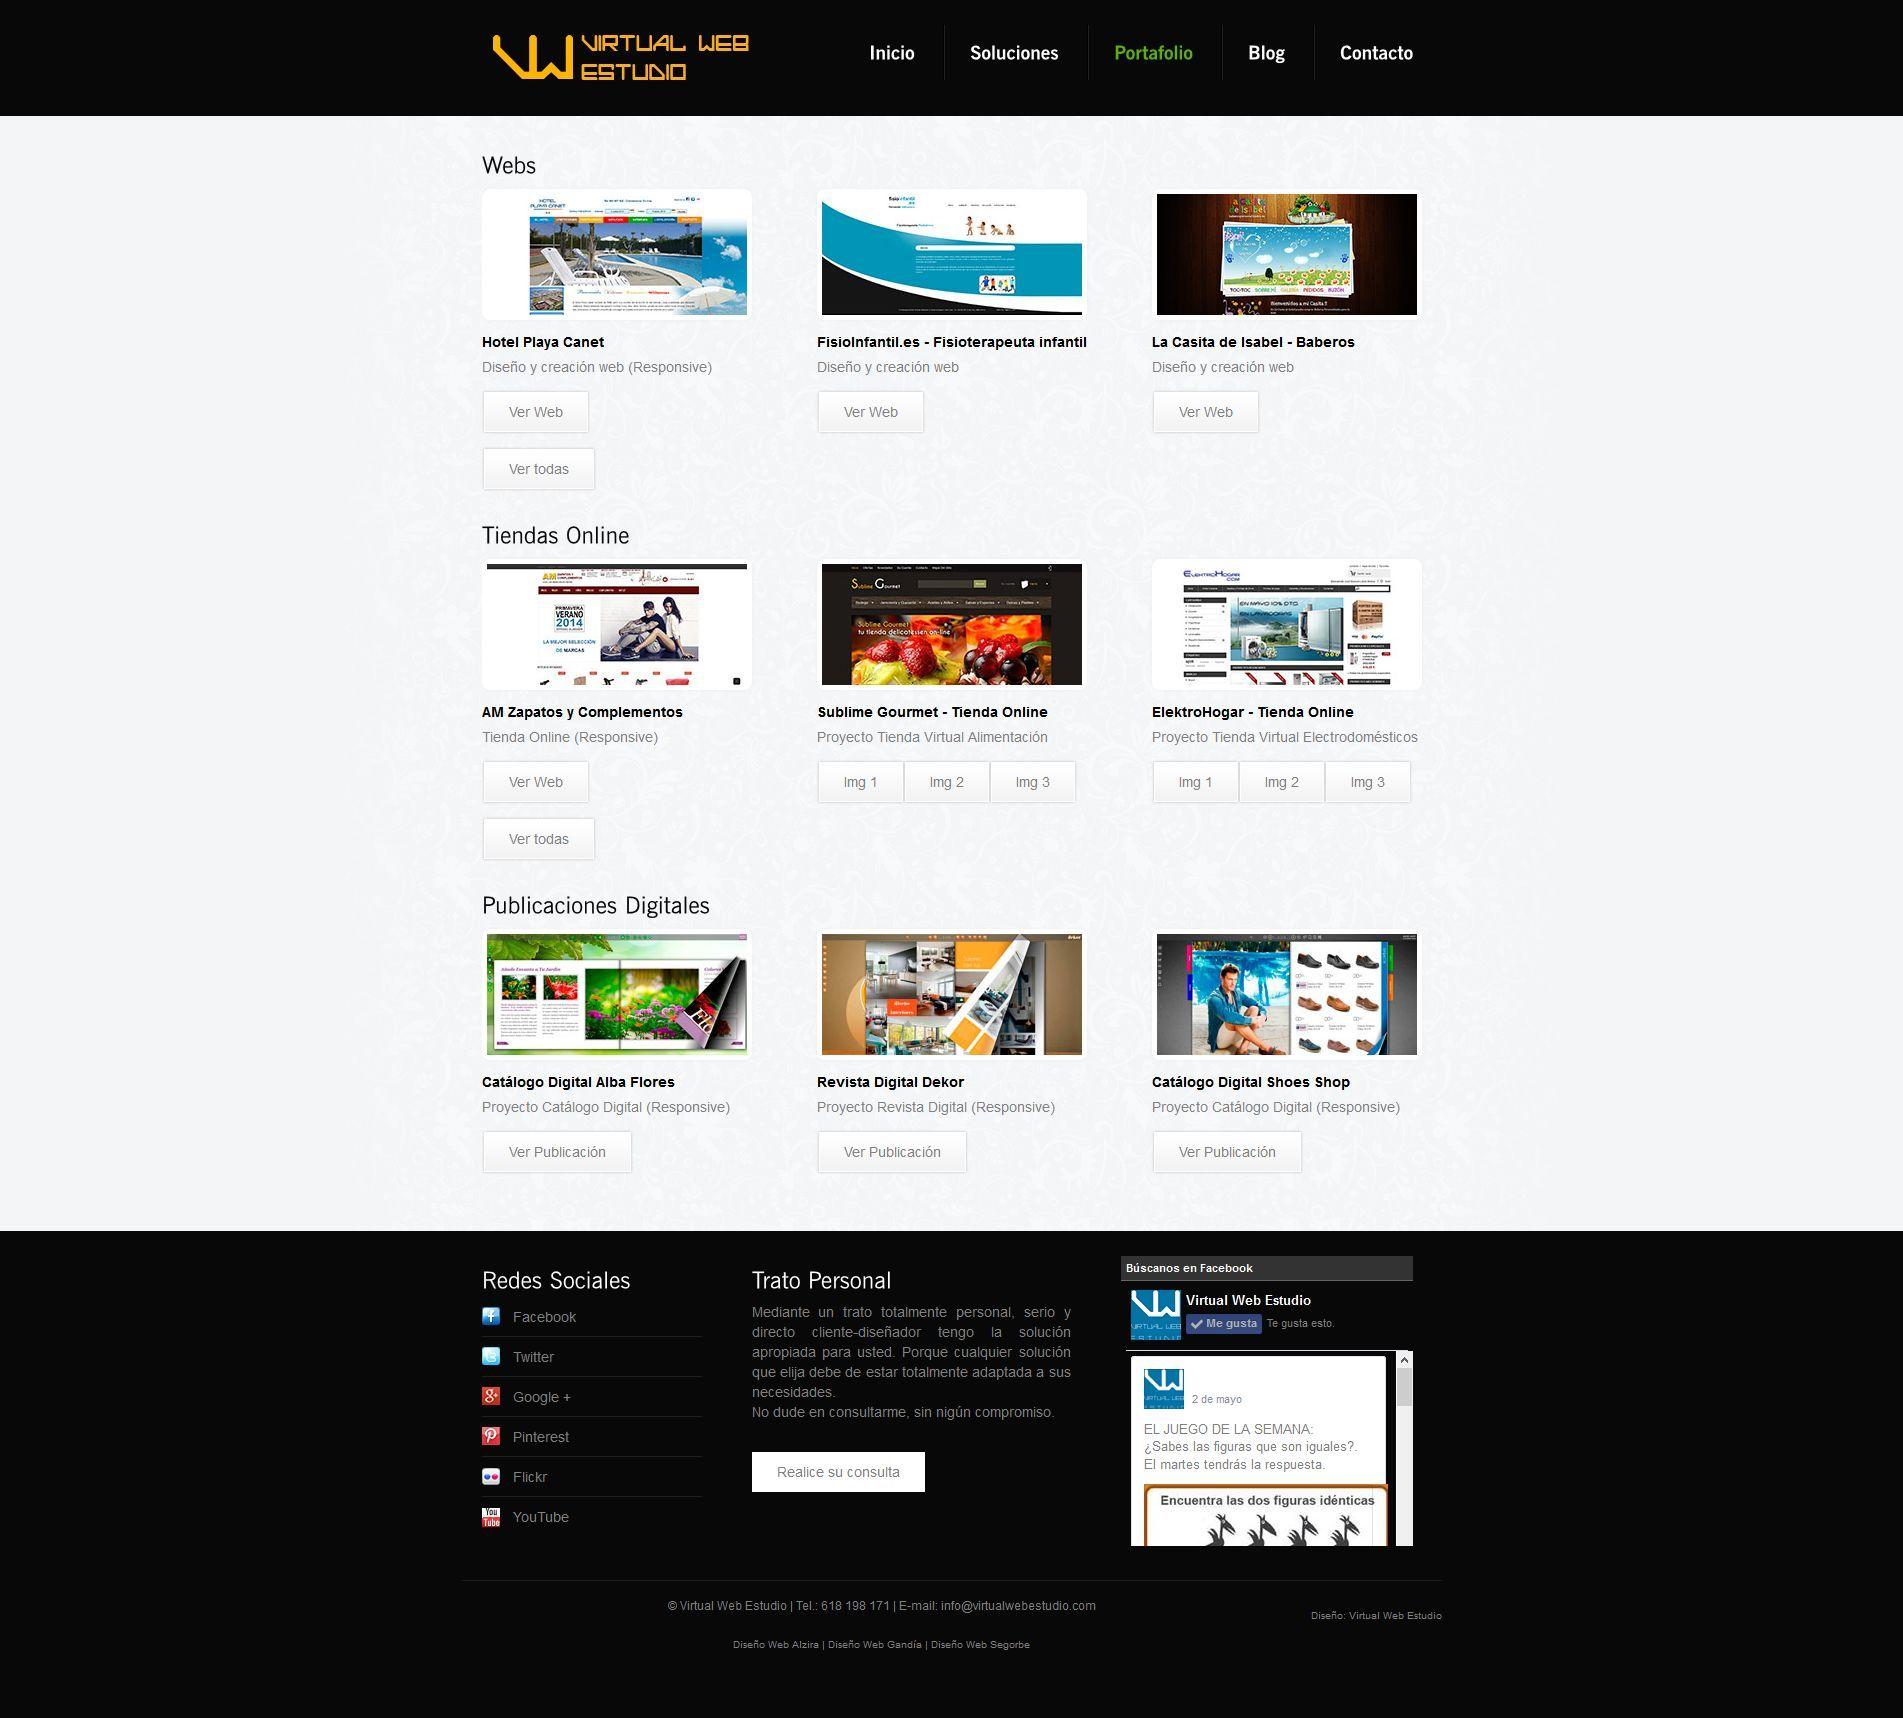 Web Virtual Web Estudio v.2 2013/14 - Portafolio #diseñoweb #paginasweb #DiseñadorWebValencia #DiseñadorWeb